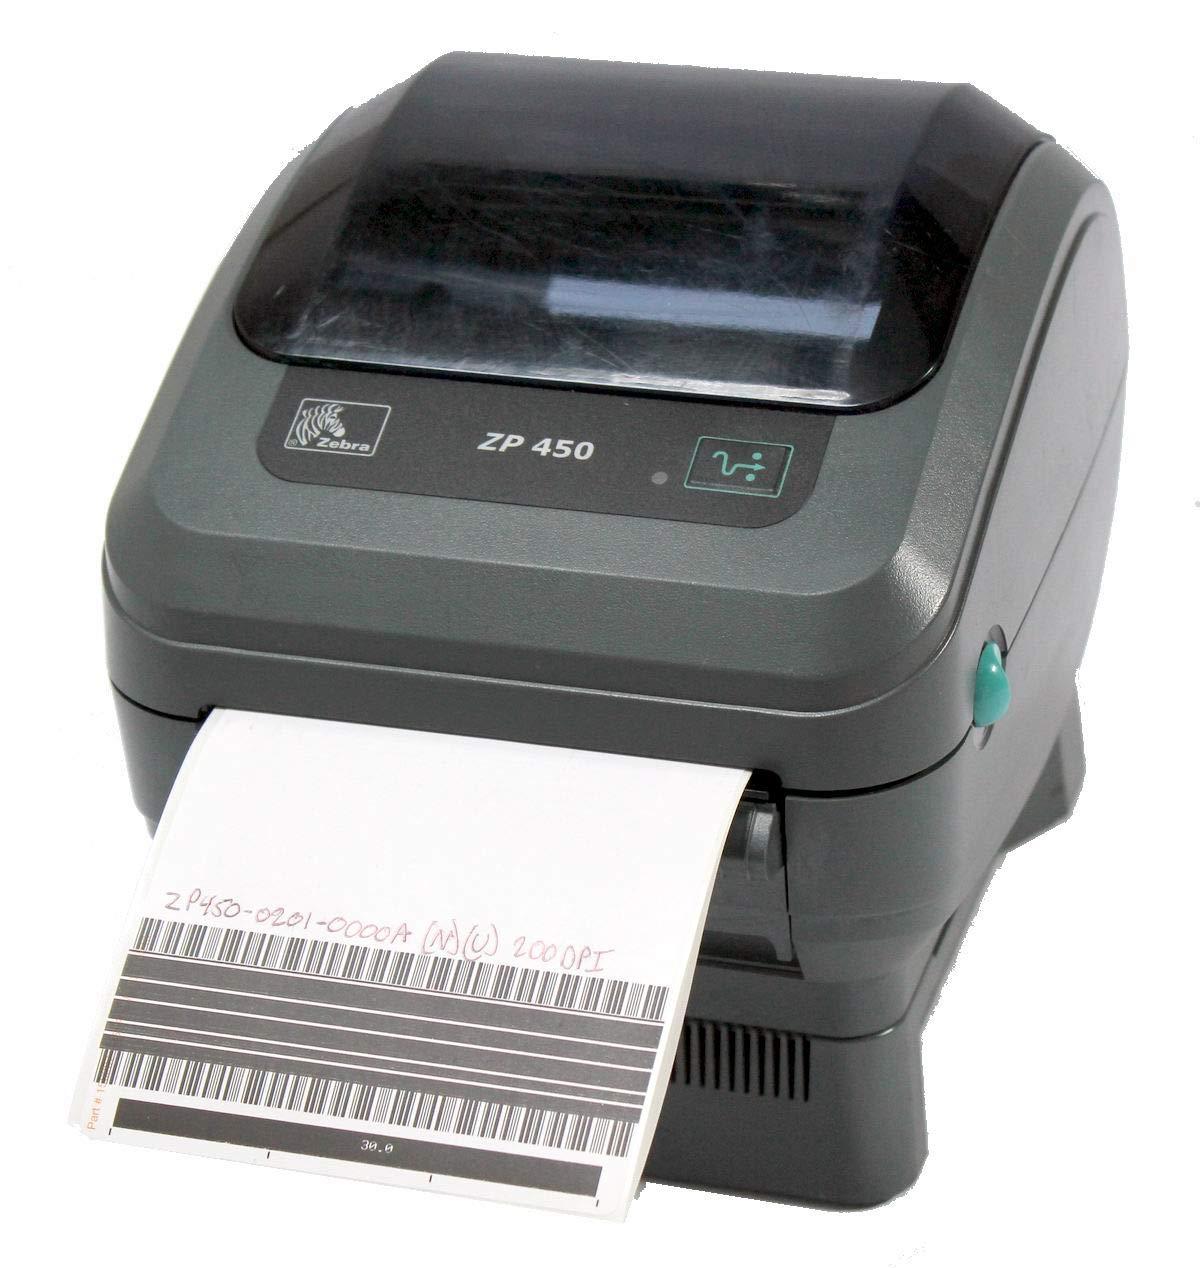 Zp 505 Thermal Printer Driver